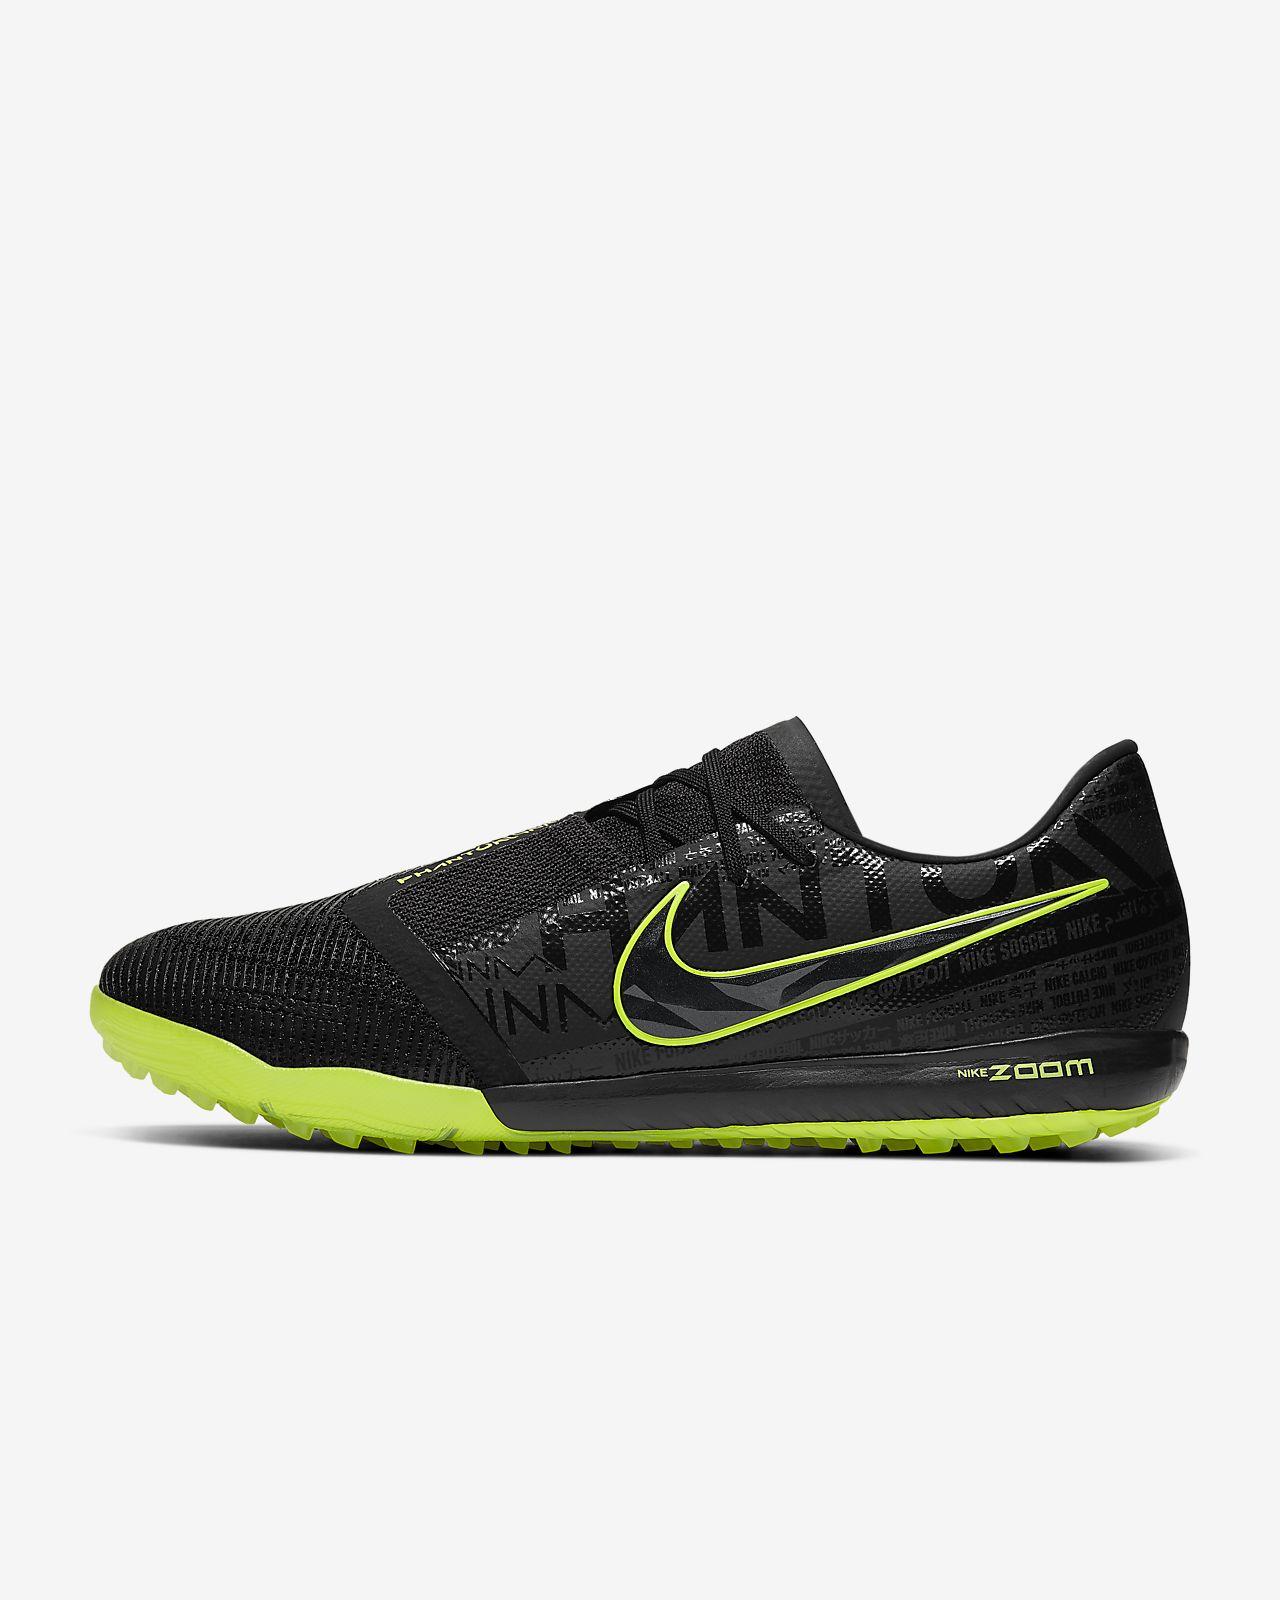 Nike Zoom Phantom Venom Pro TF fotballsko til grus/turf